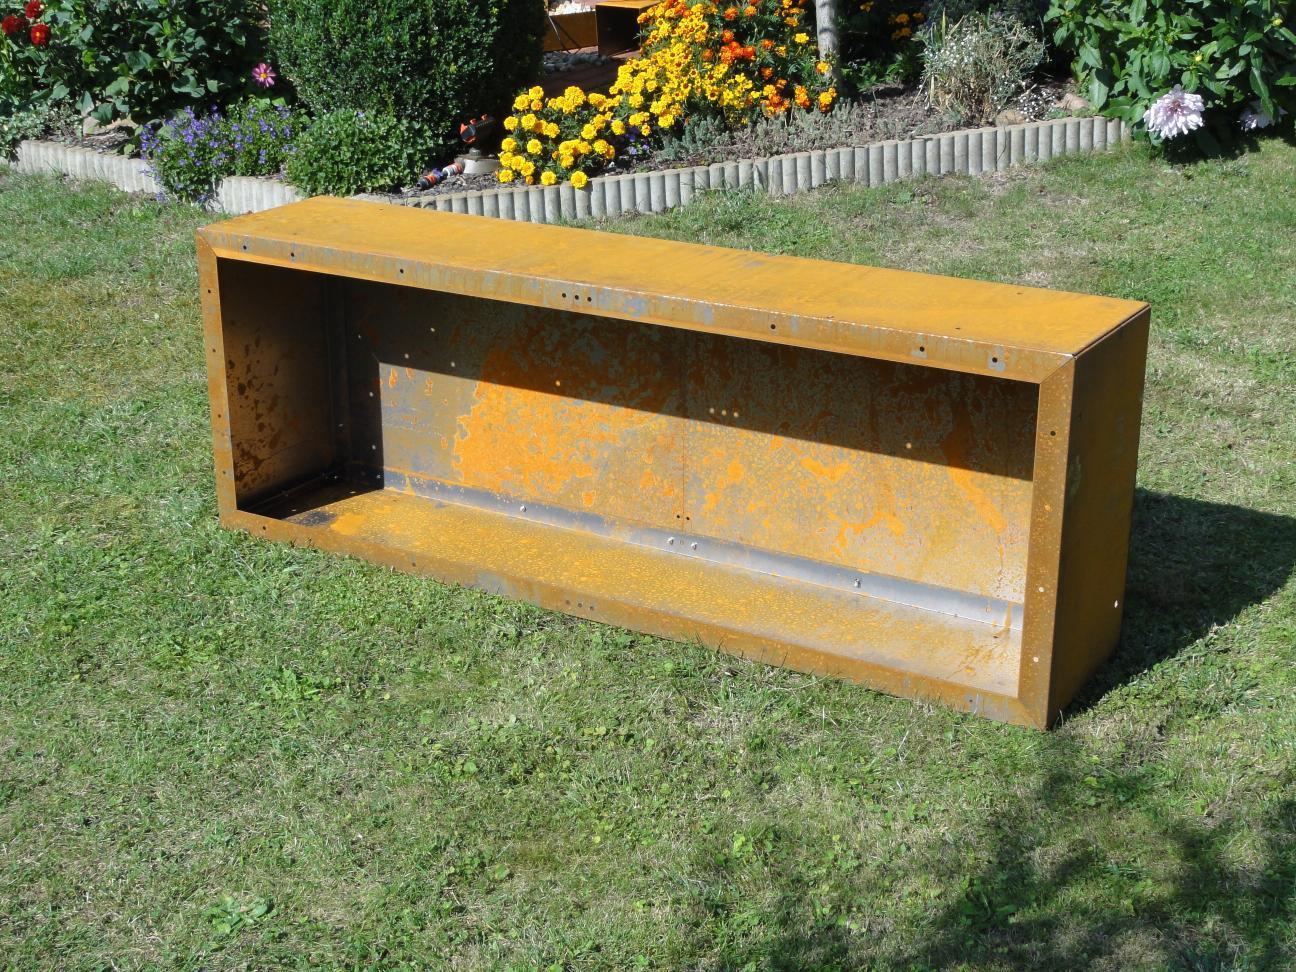 r ckwand f r kaminholzregal 1 9m x 0 6m corten edelrost. Black Bedroom Furniture Sets. Home Design Ideas